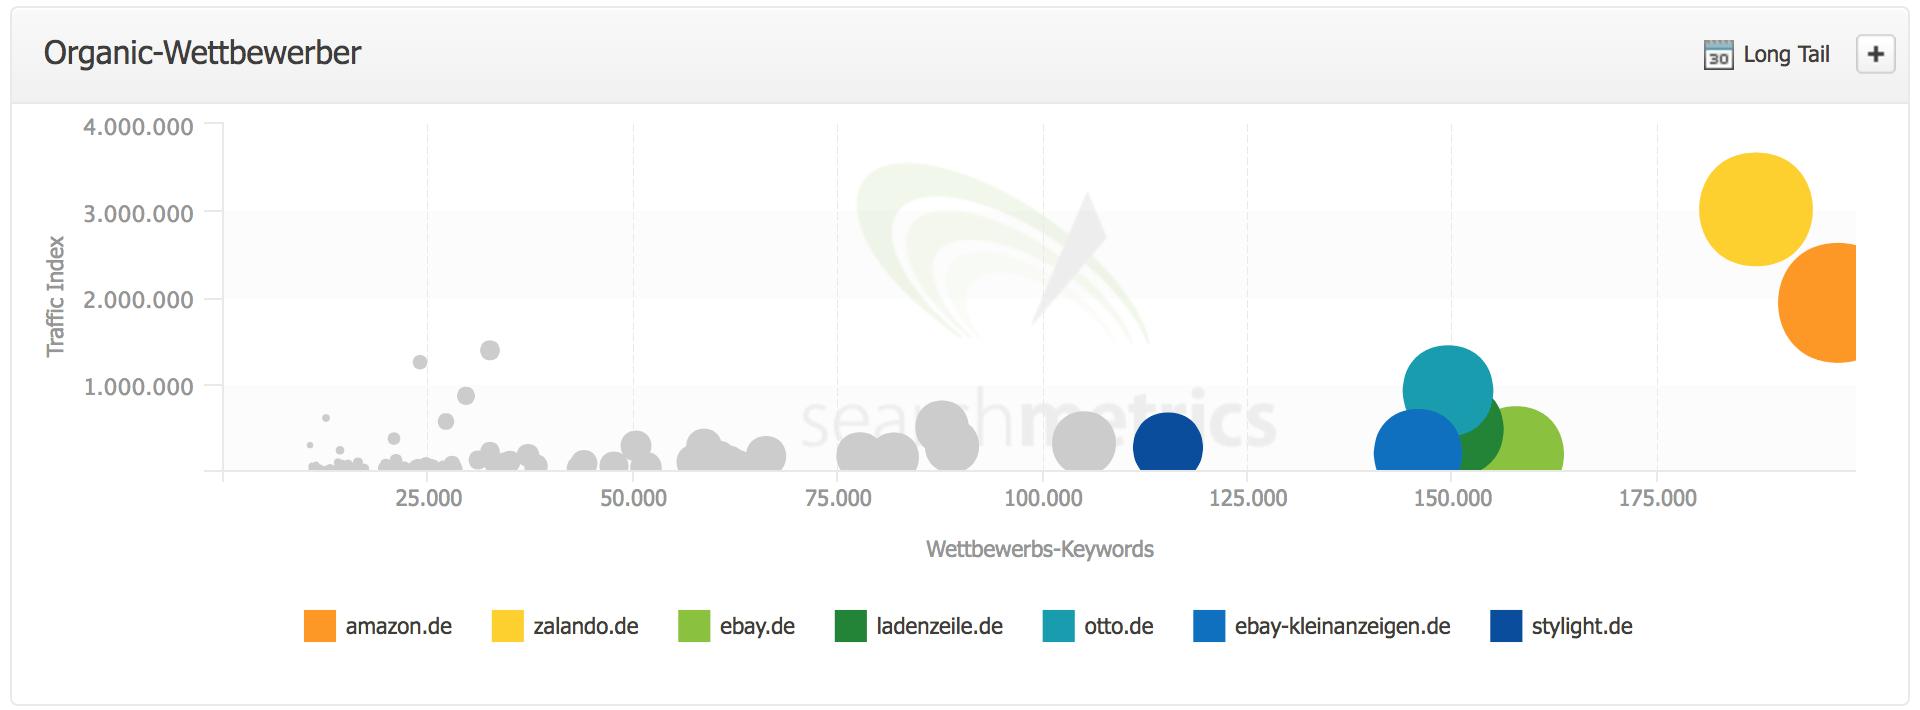 Organic Wettbewerber - SEO Research-Bereich // Searchmetrics Essentials